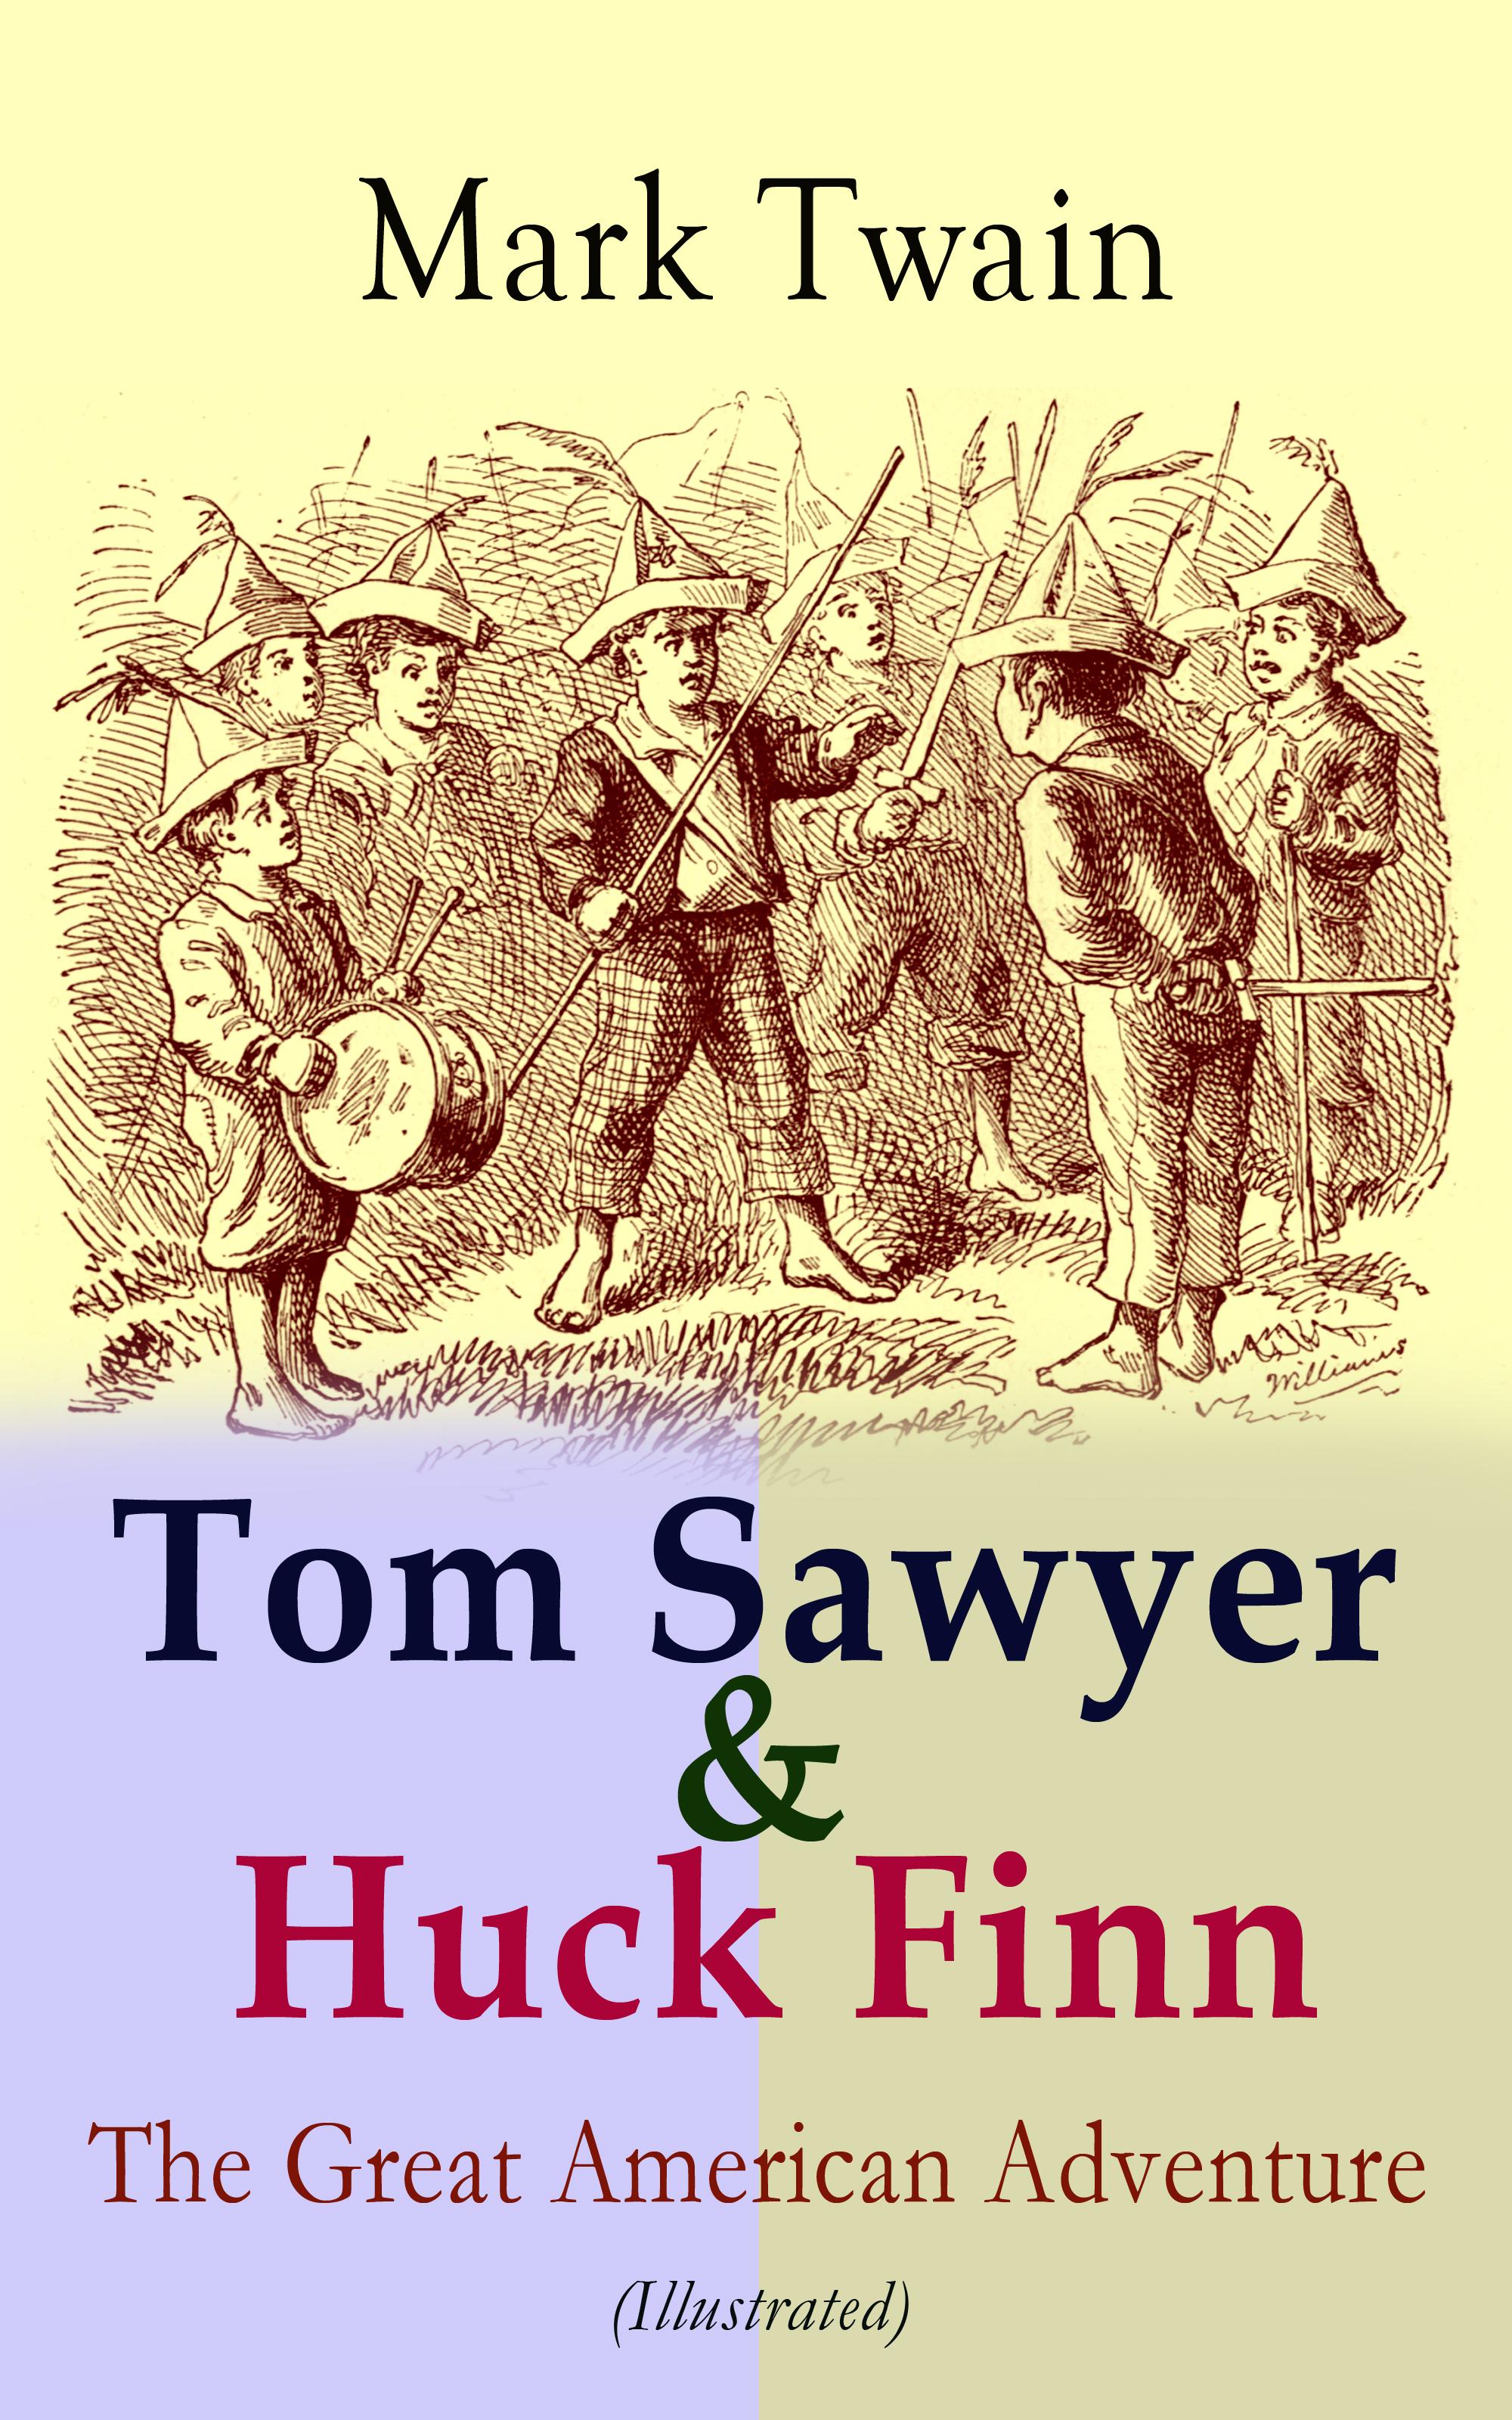 Mark twain Tom Sawyer & Huck Finn – The Great American Adventure (Illustrated) mark hampton an american decorator